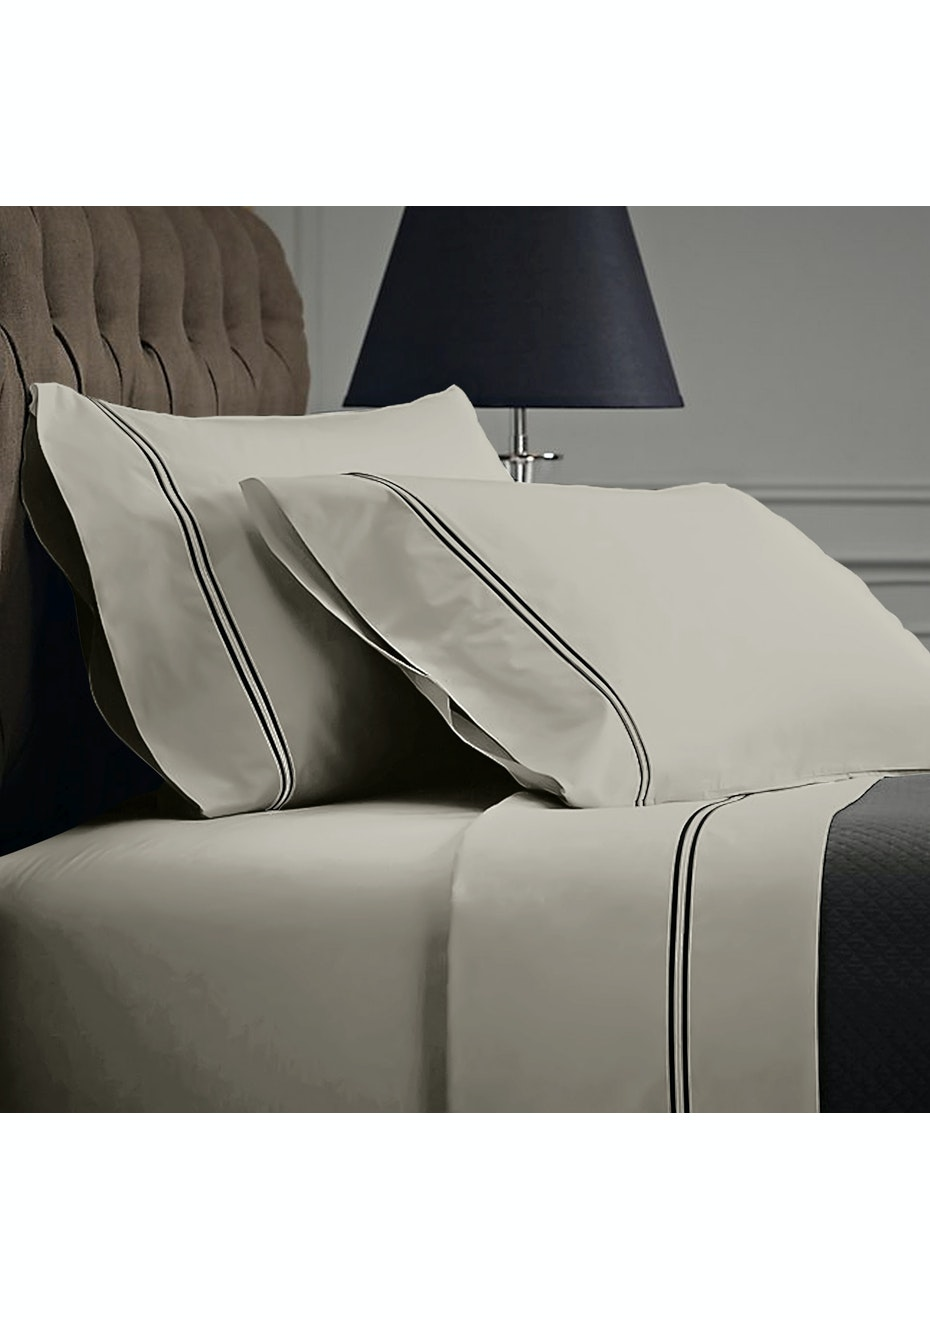 Style & Co 1000 Thread count Egyptian Cotton Hotel Collection Sorrento Sheet sets Mega Queen Silver